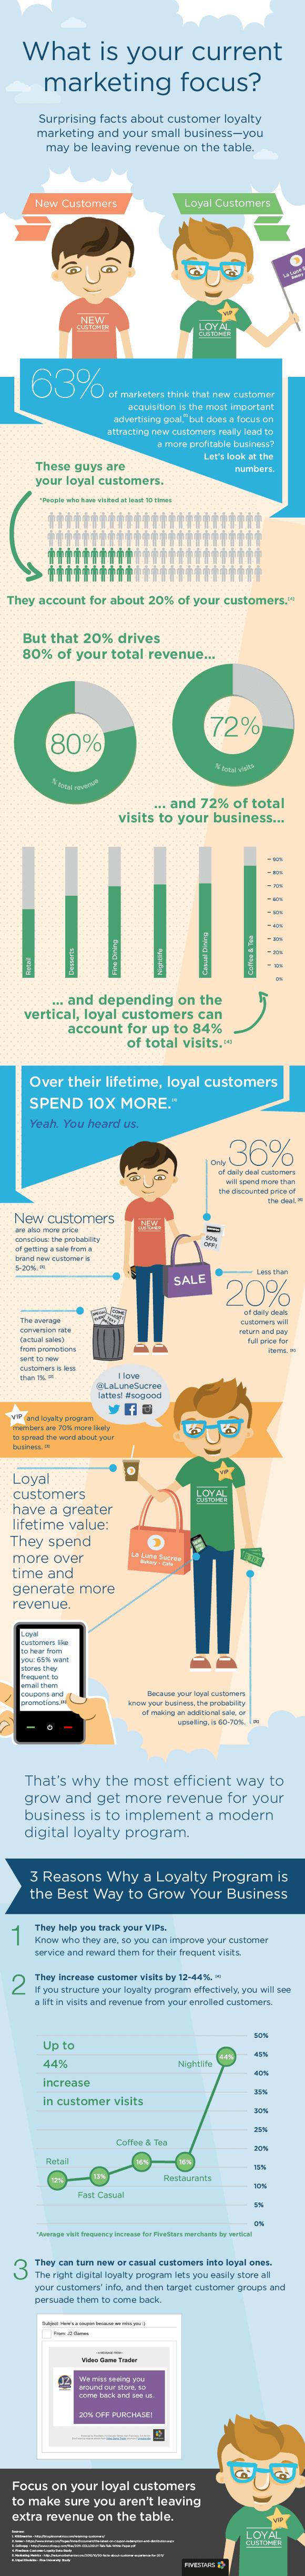 LoyalvsNewCustomer-Infographic_skal